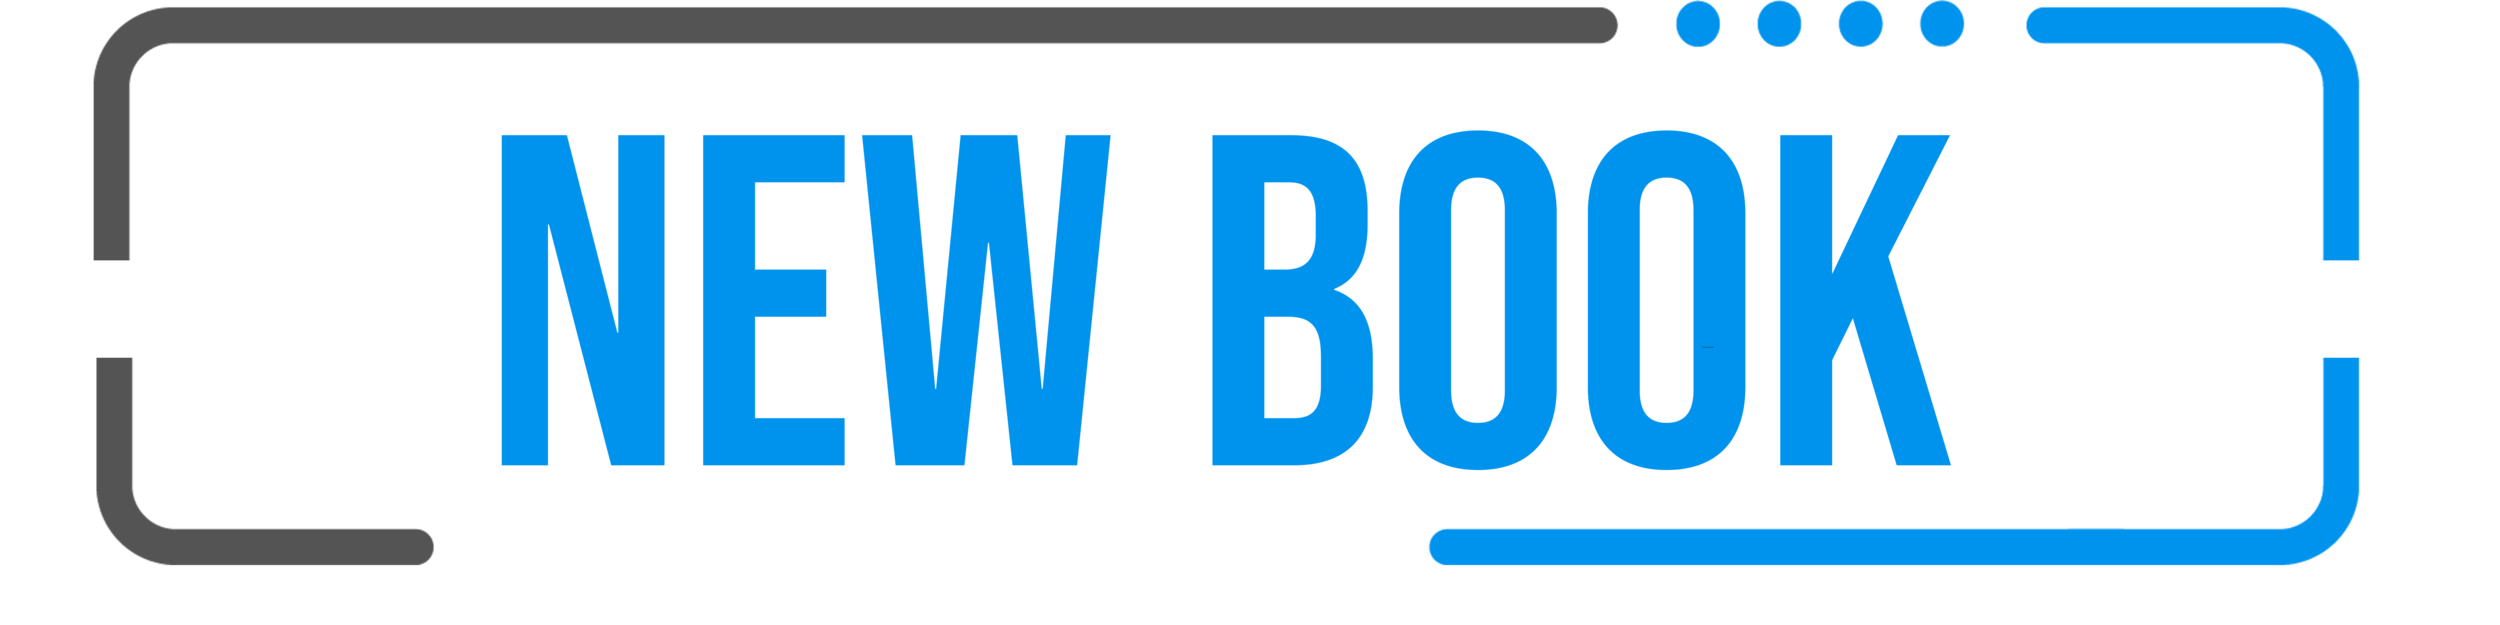 newbookTitleGraphic.png